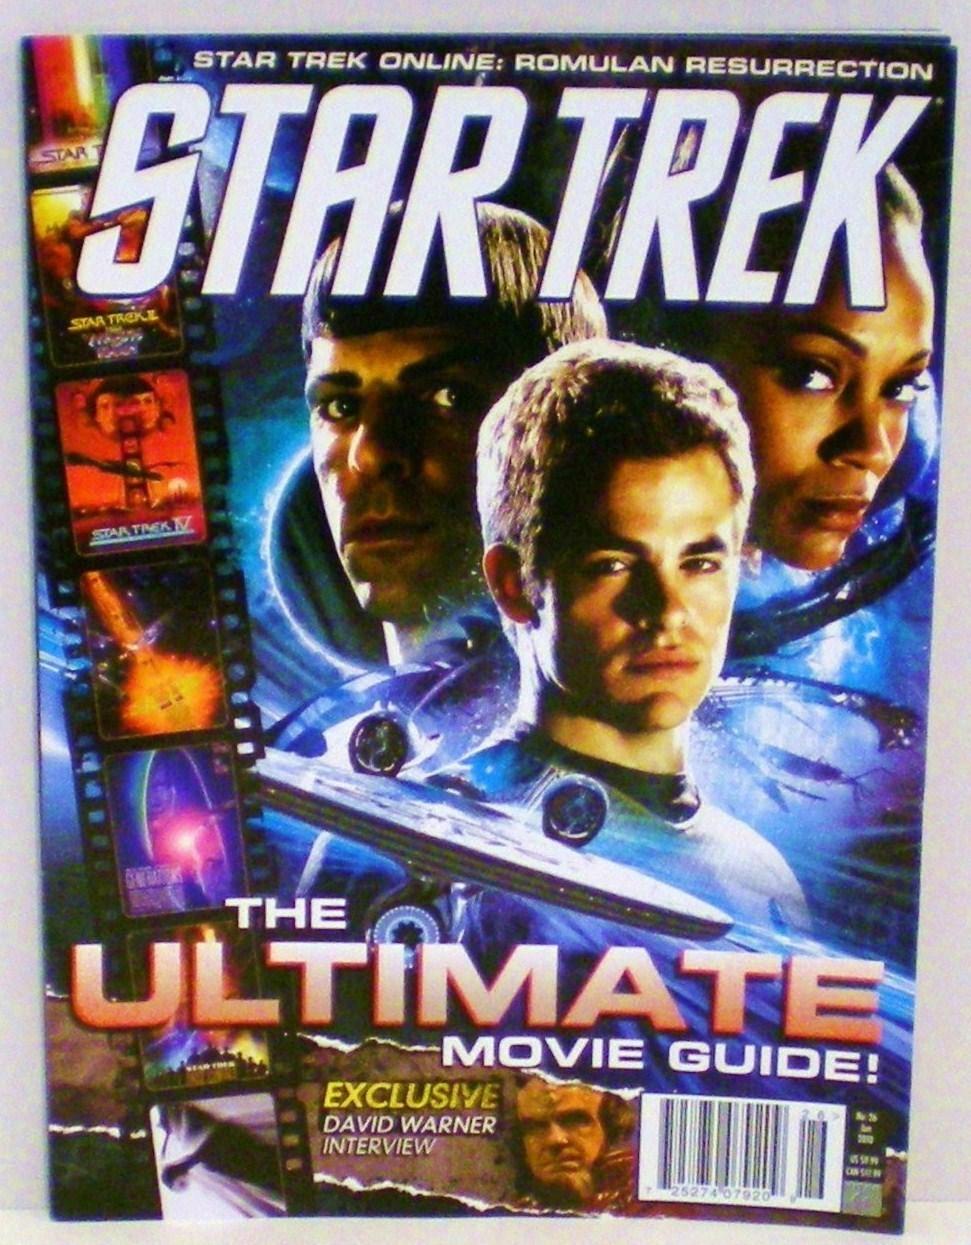 Image 2 of Star Trek Magazine issue 26 Ultimate Star Trek Movie Guide